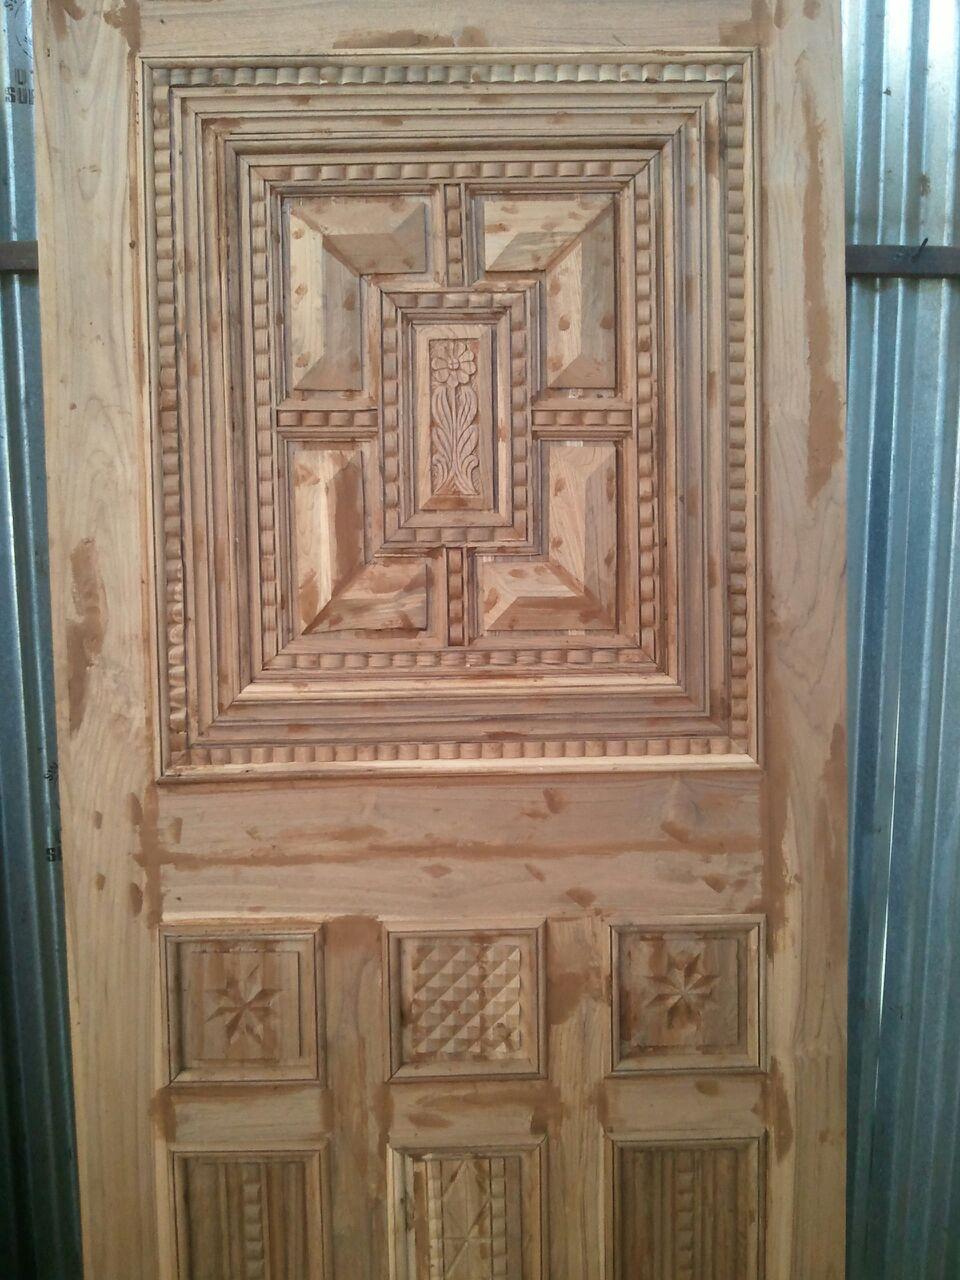 Buy teak wood doors from fortune teak doors plywoods for Readymade teak wood doors hyderabad